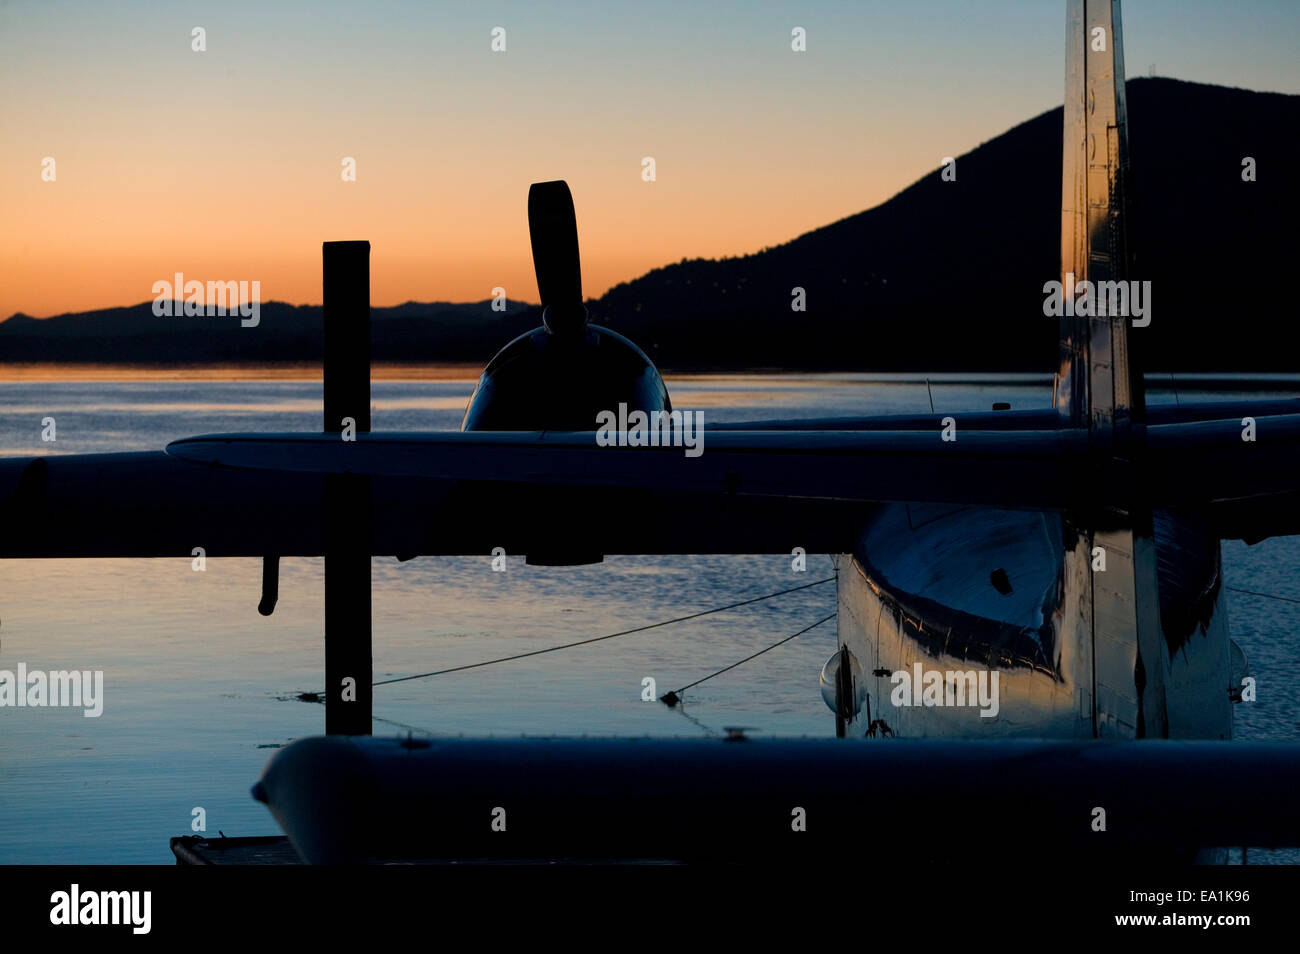 Seaplane Splash-In, Lakeport, California, Lake County, California - Stock Image